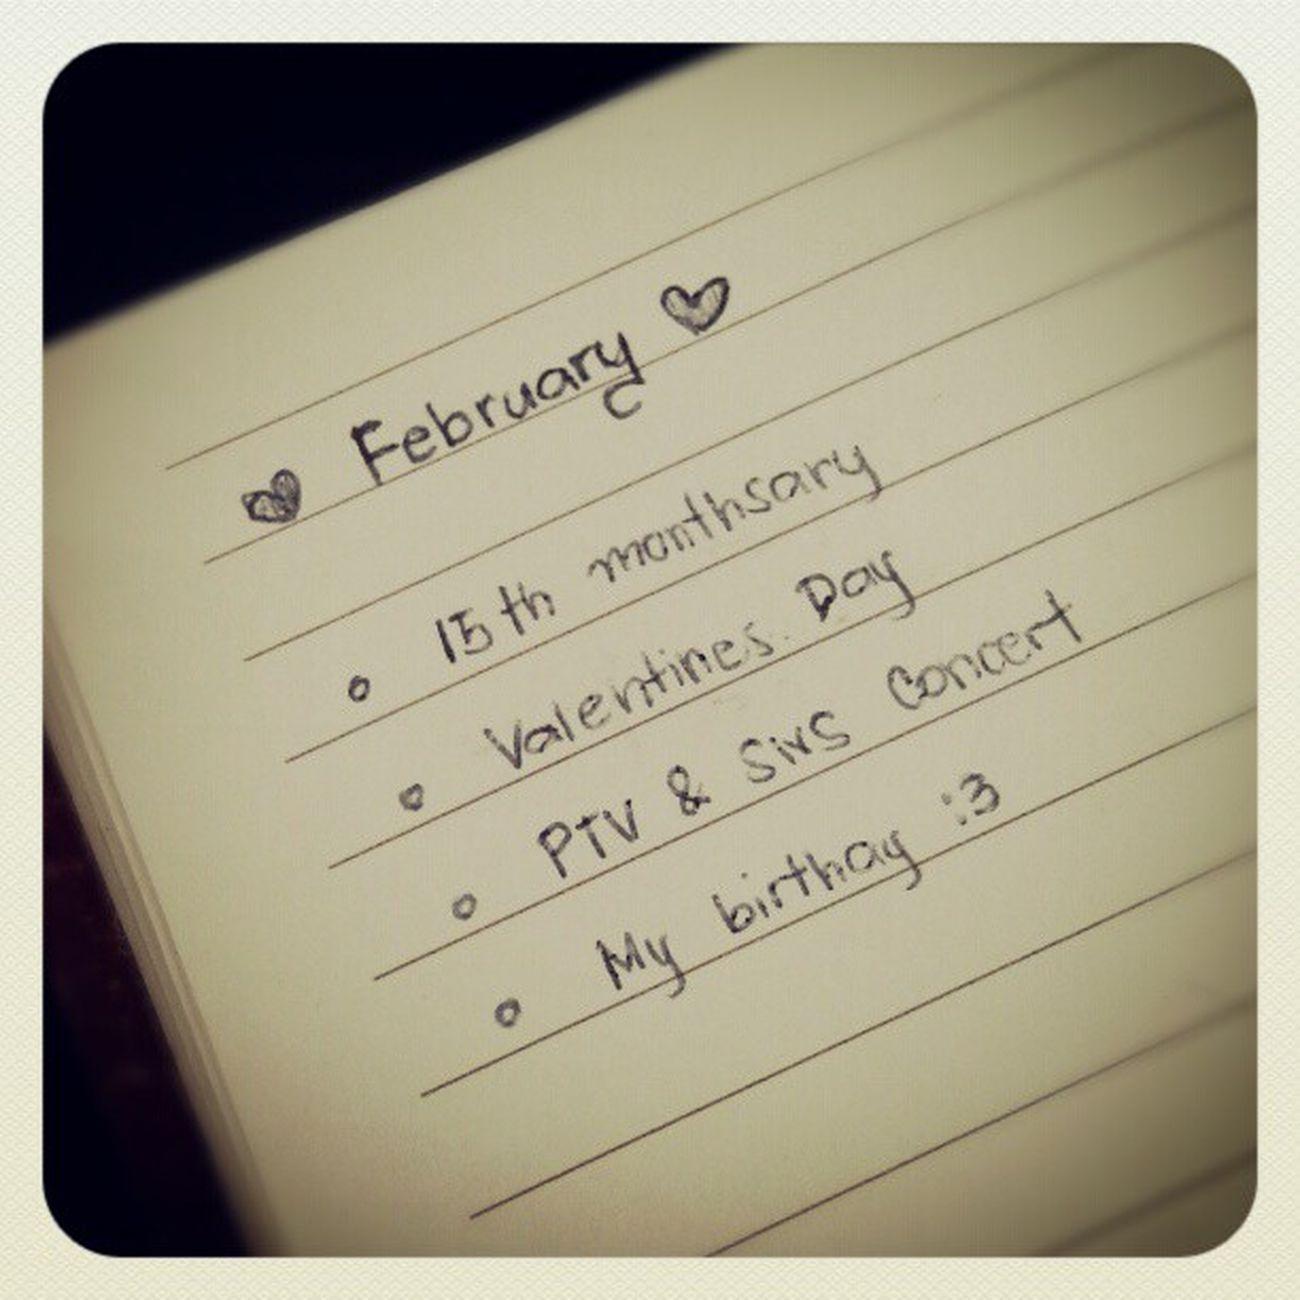 Happenings this February :3 Happyfebruary Piercetheveil Sleepingwithsirens Monthsary atwork